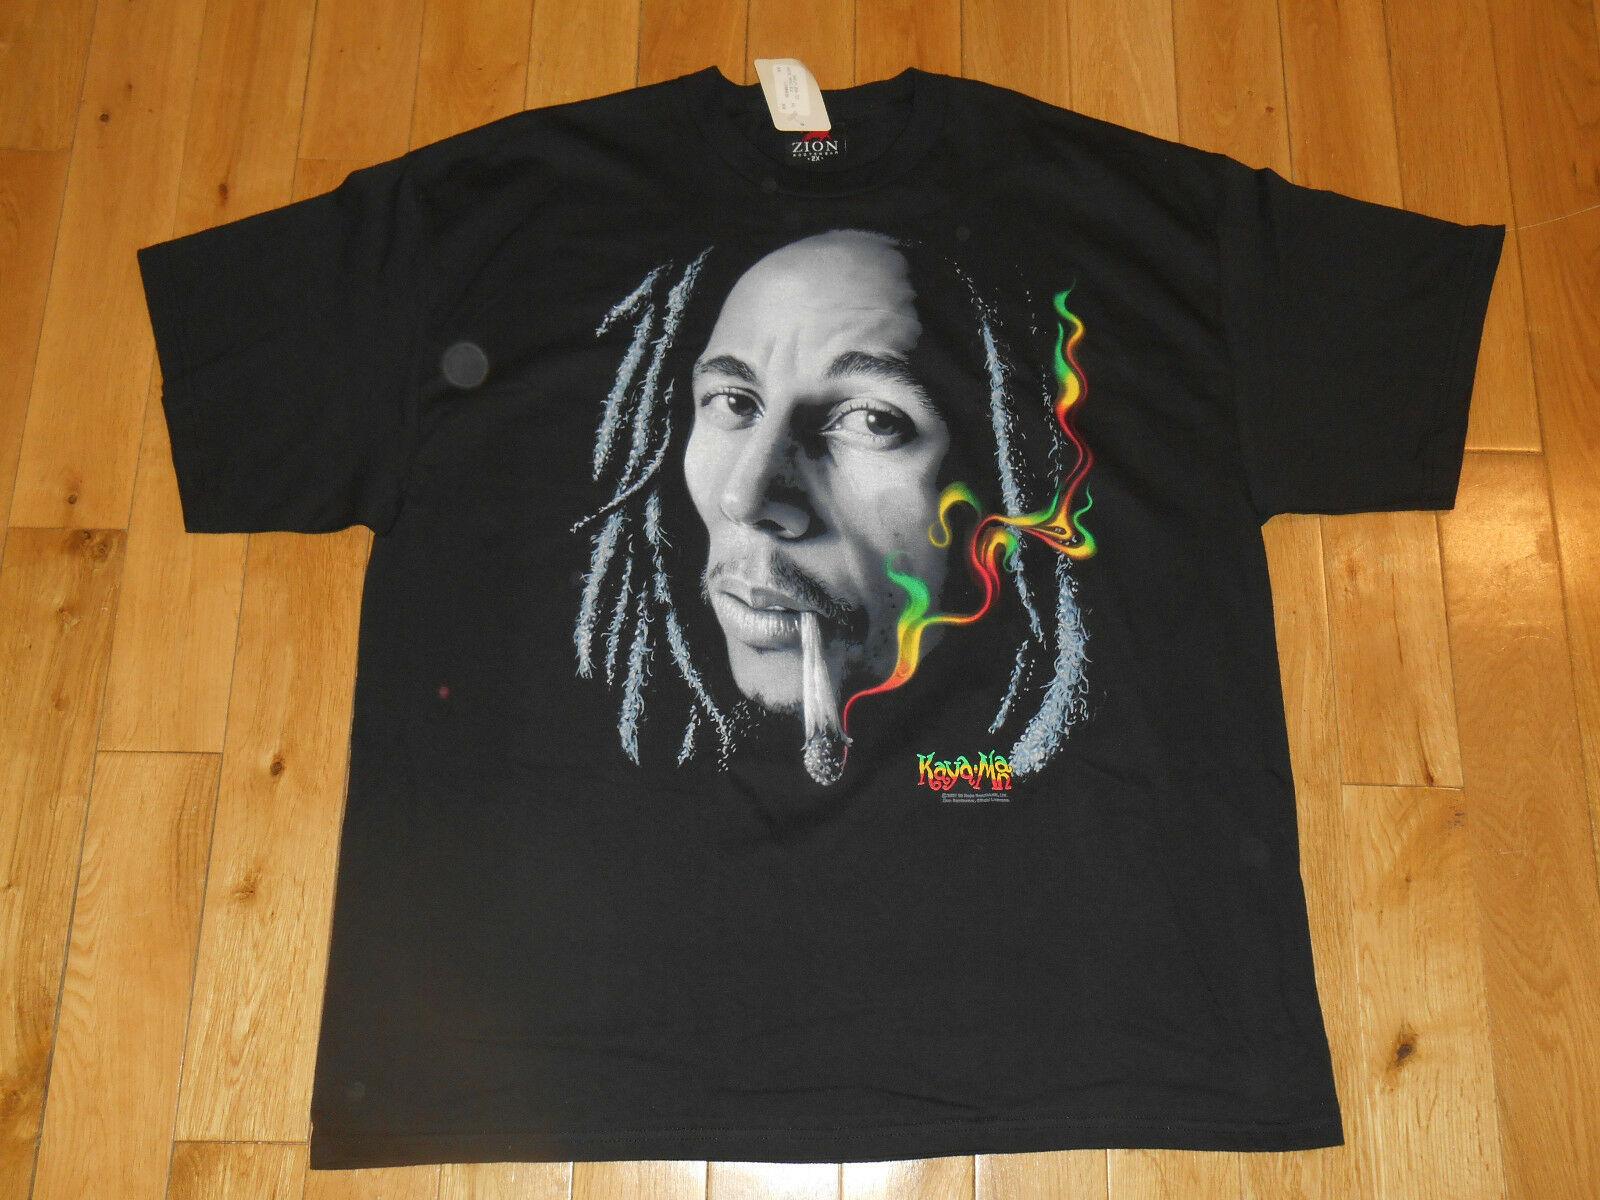 Nwt Bob Marley los balleneros Rasta humo Kaya hombre Zion Rootswear Mens T camisa 2Xl